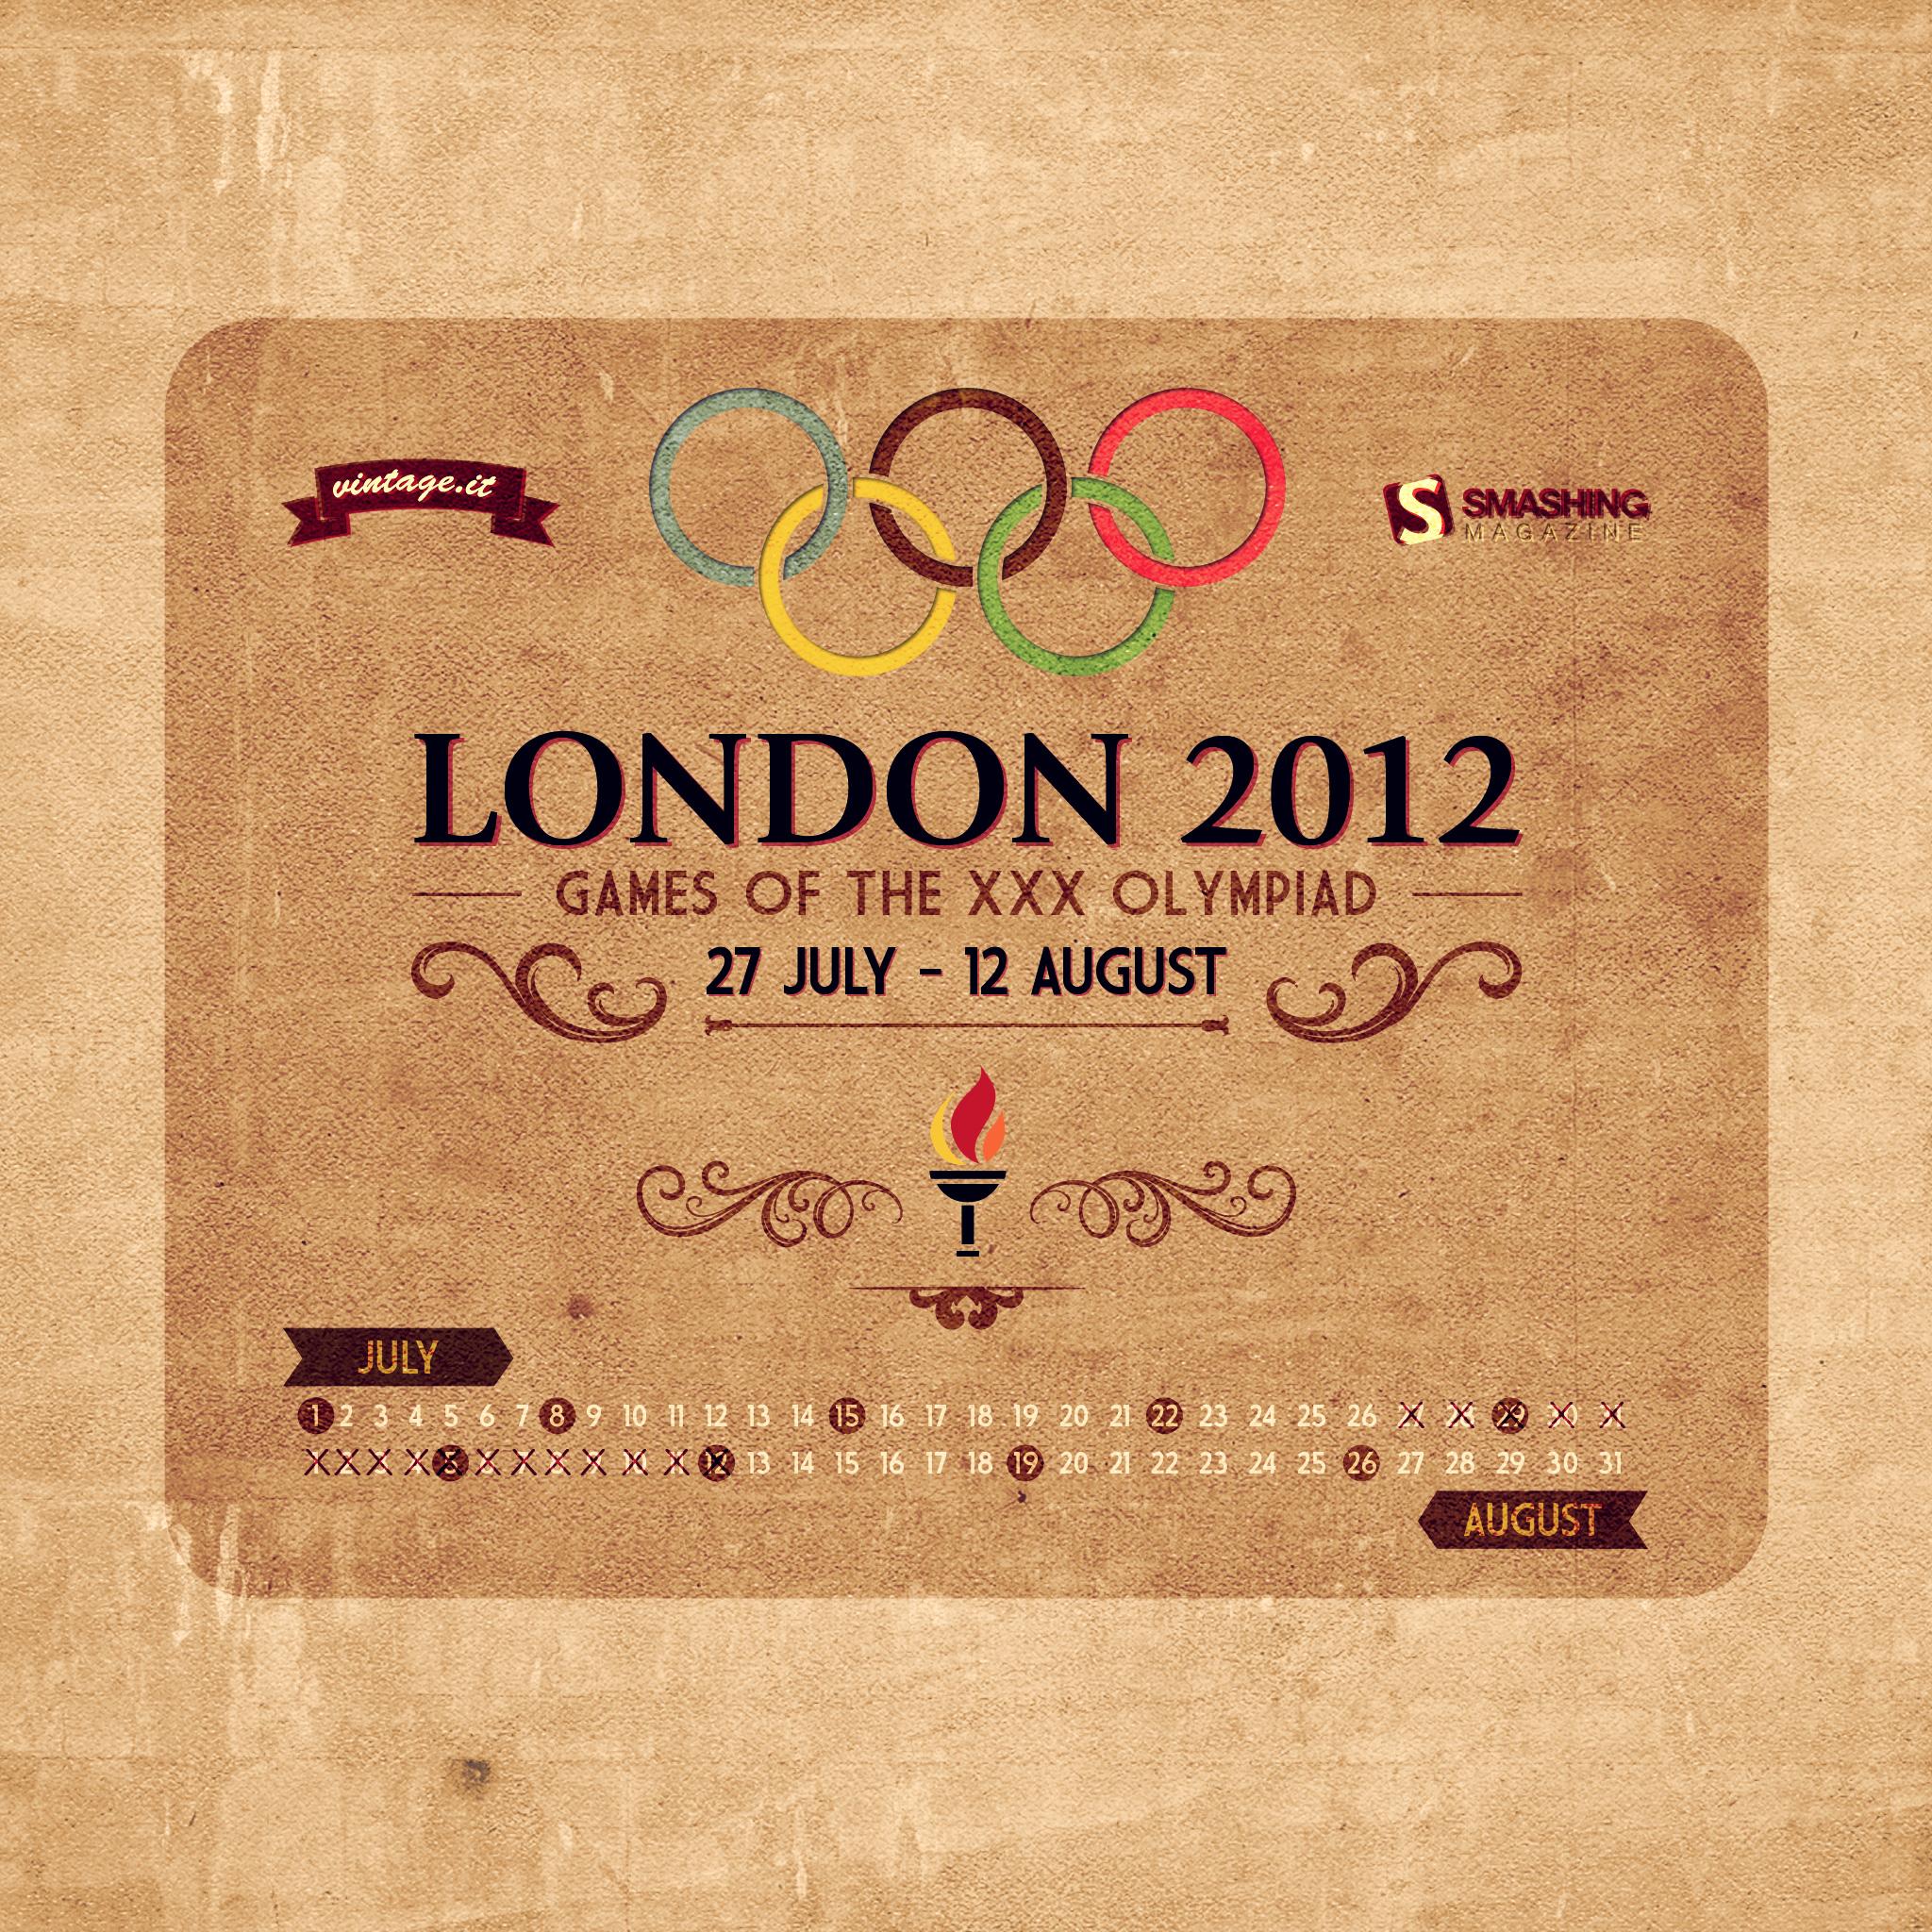 Vintage Iphone Wallpaper: London 2012 Olympics